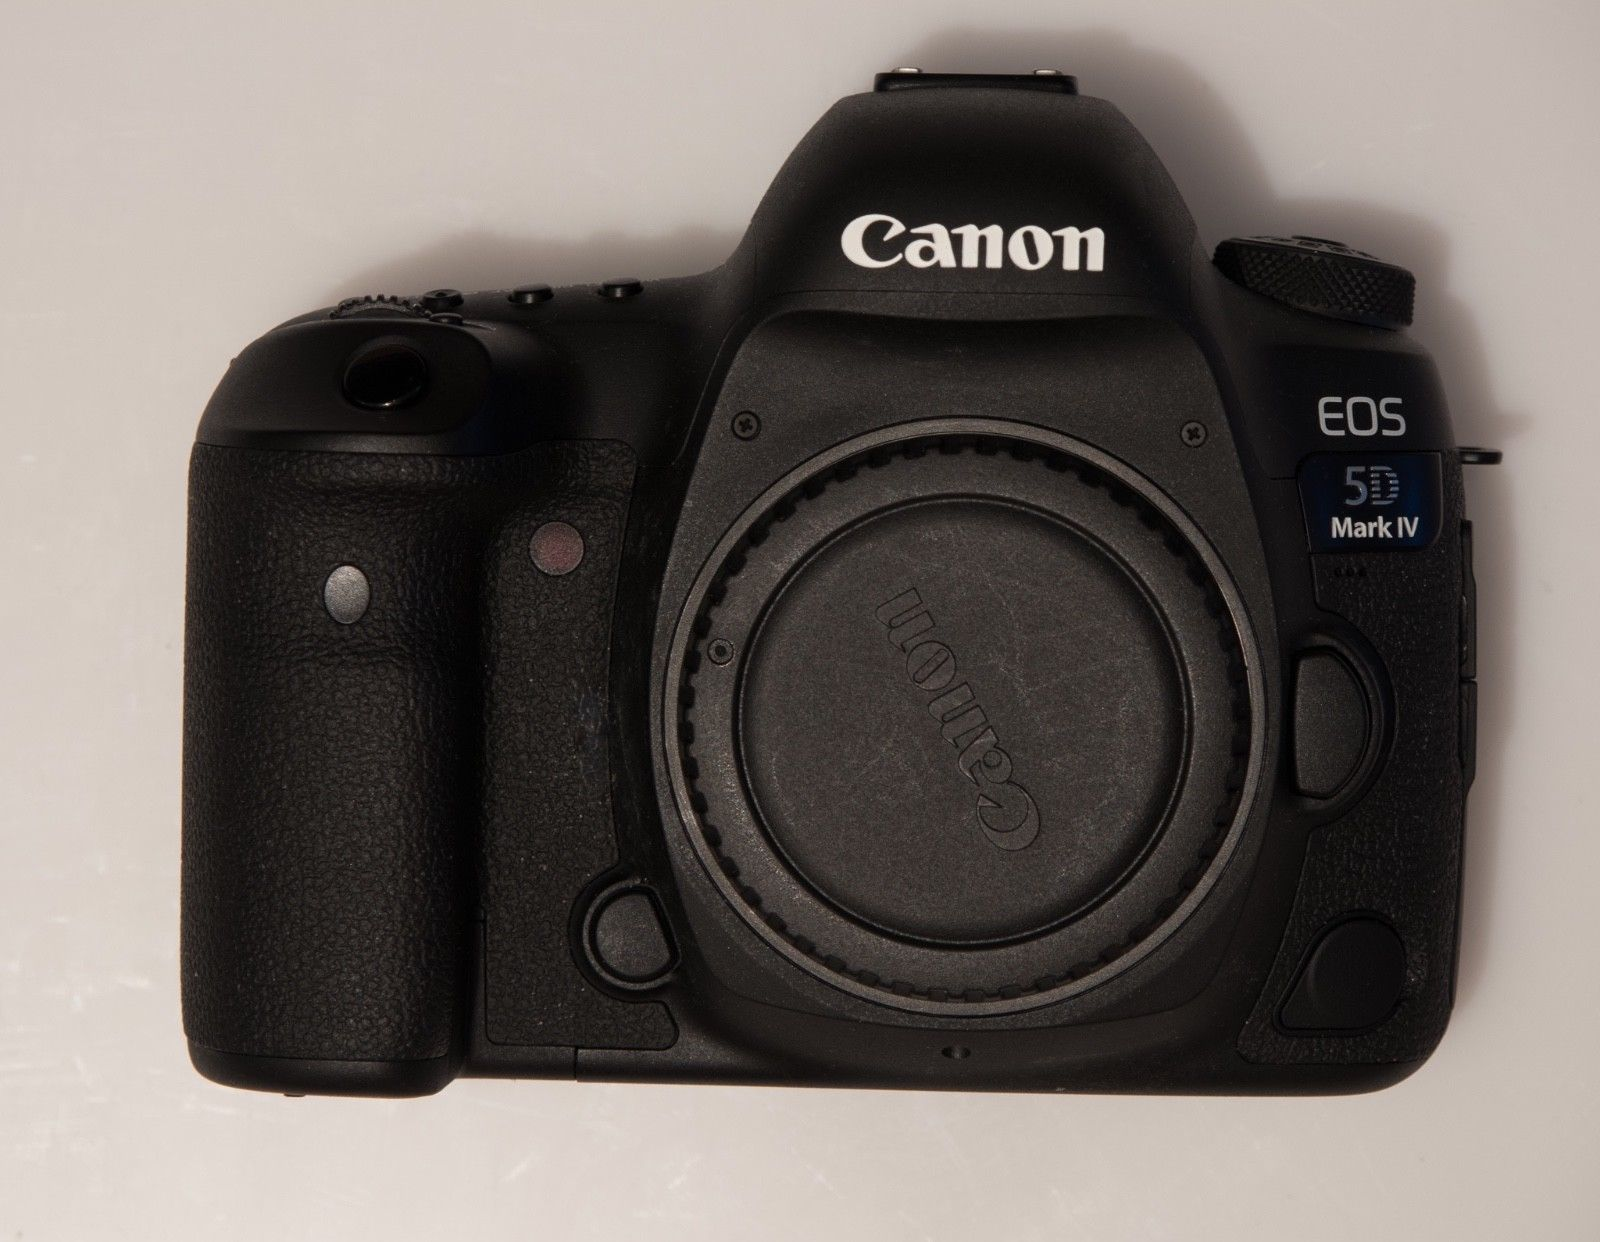 Canon EOS 5D Mark IV 30.4 MP Digital Camera - Schwarz (Nur Gehäuse)